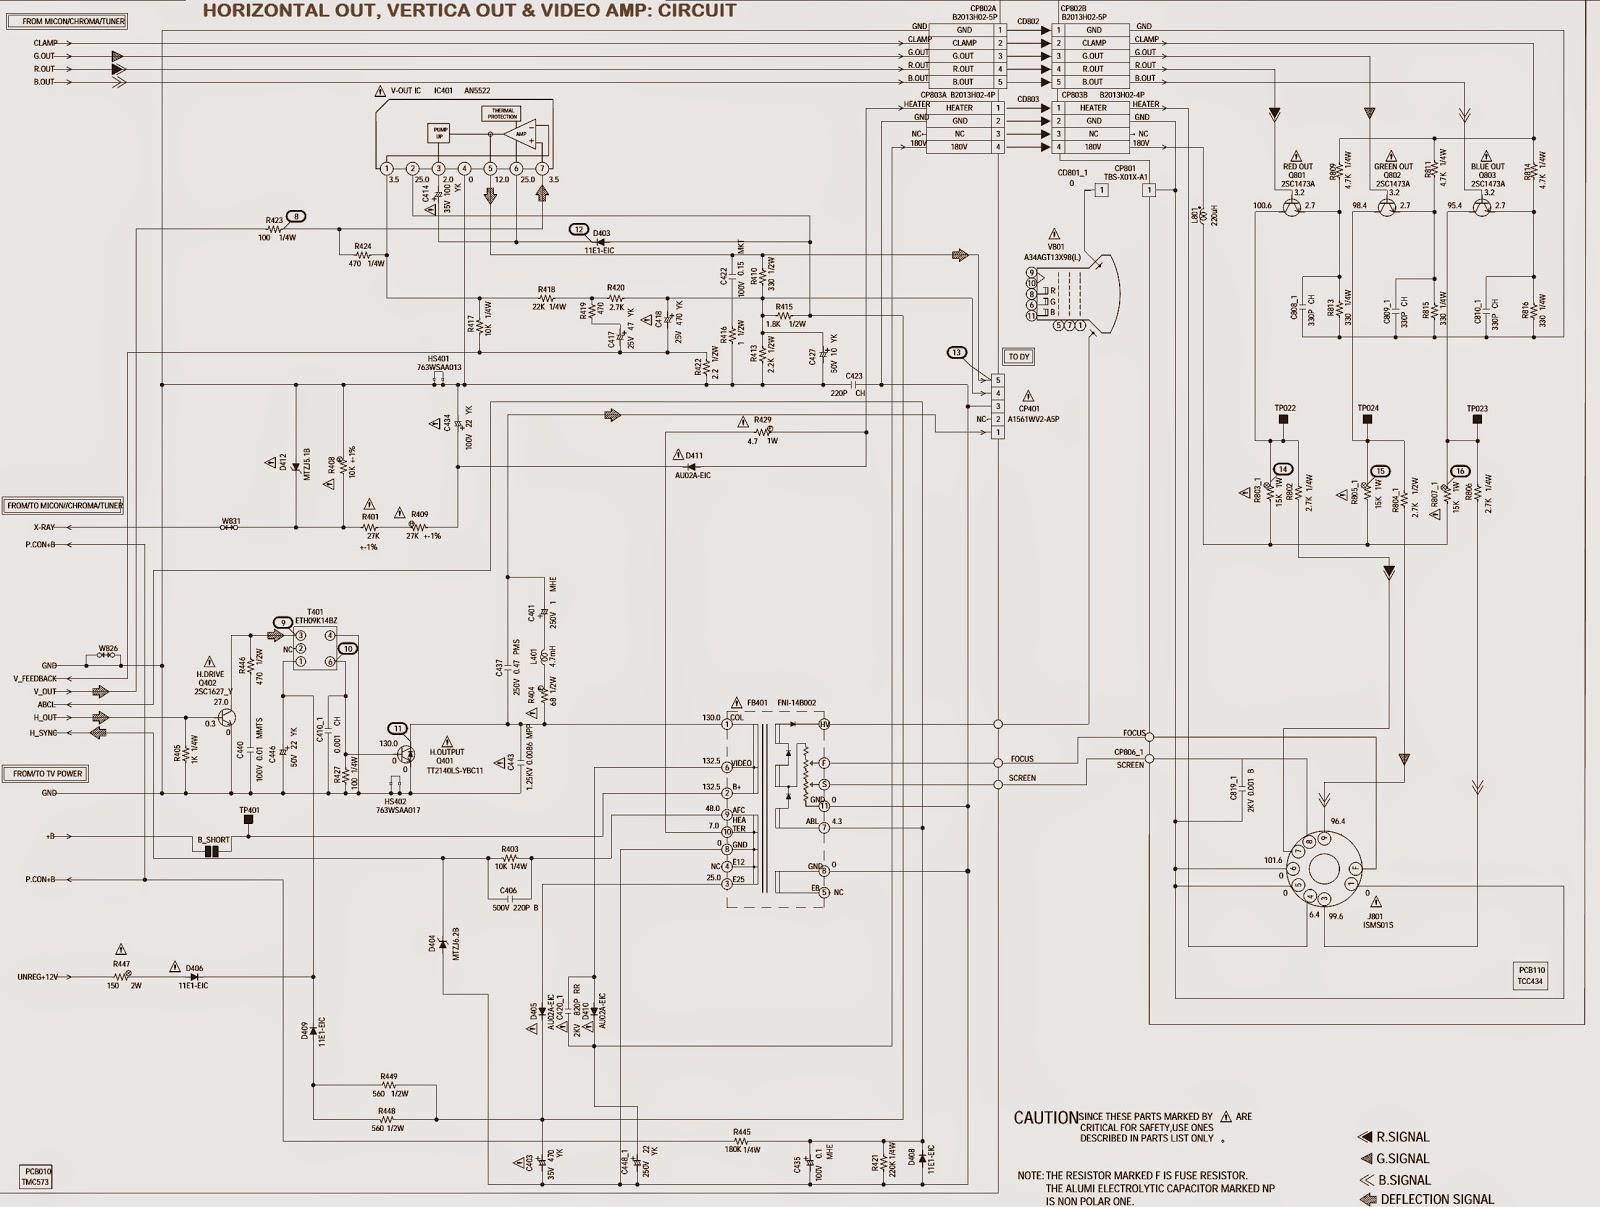 PANASONIC CTZ1423 _ CIRCUIT DIAGRAM (Schematic)  SMPS